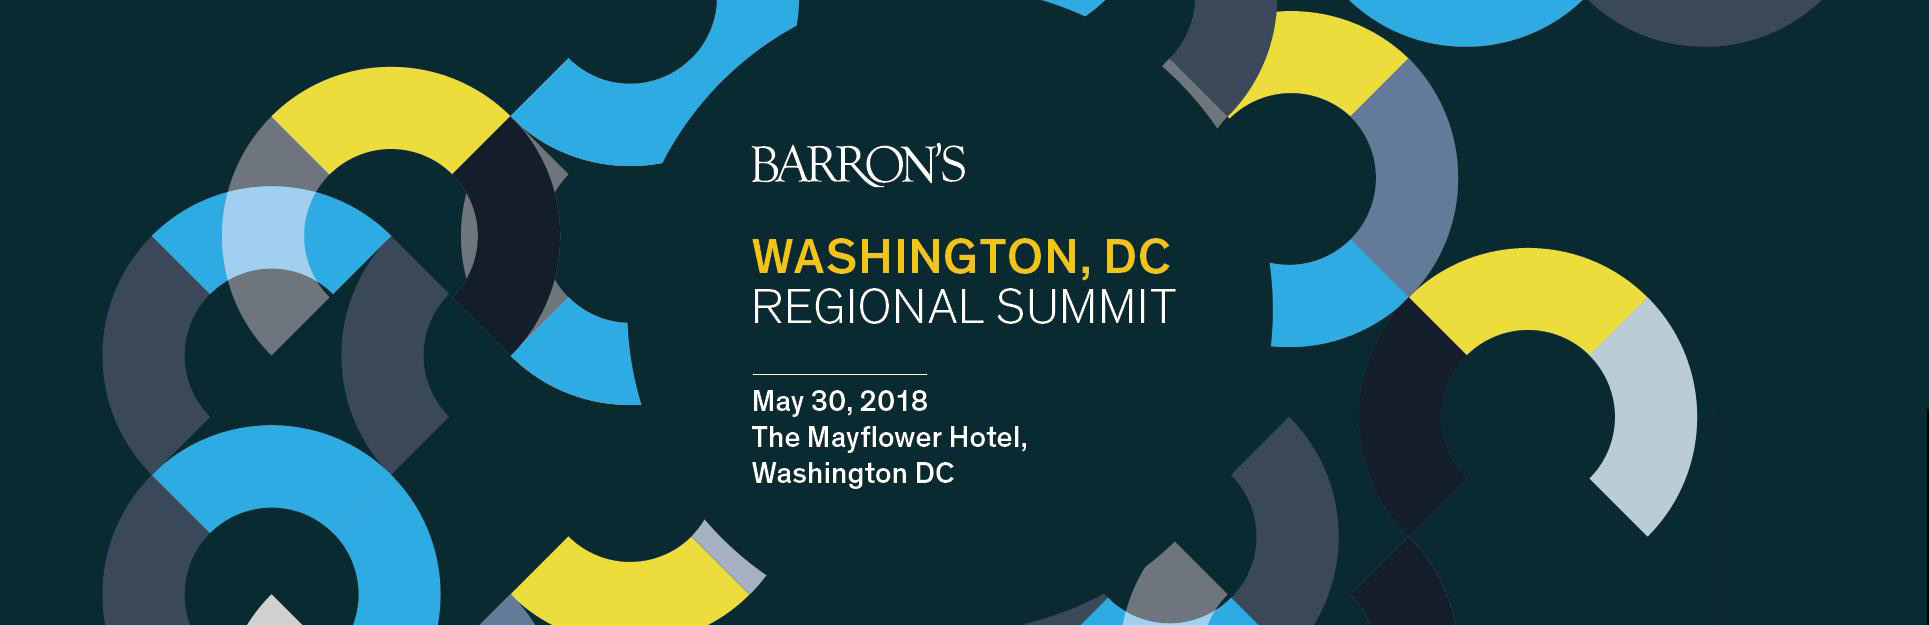 David D. Kassir, Financial Advisor, chosen to attend the Barron's Regional Summit